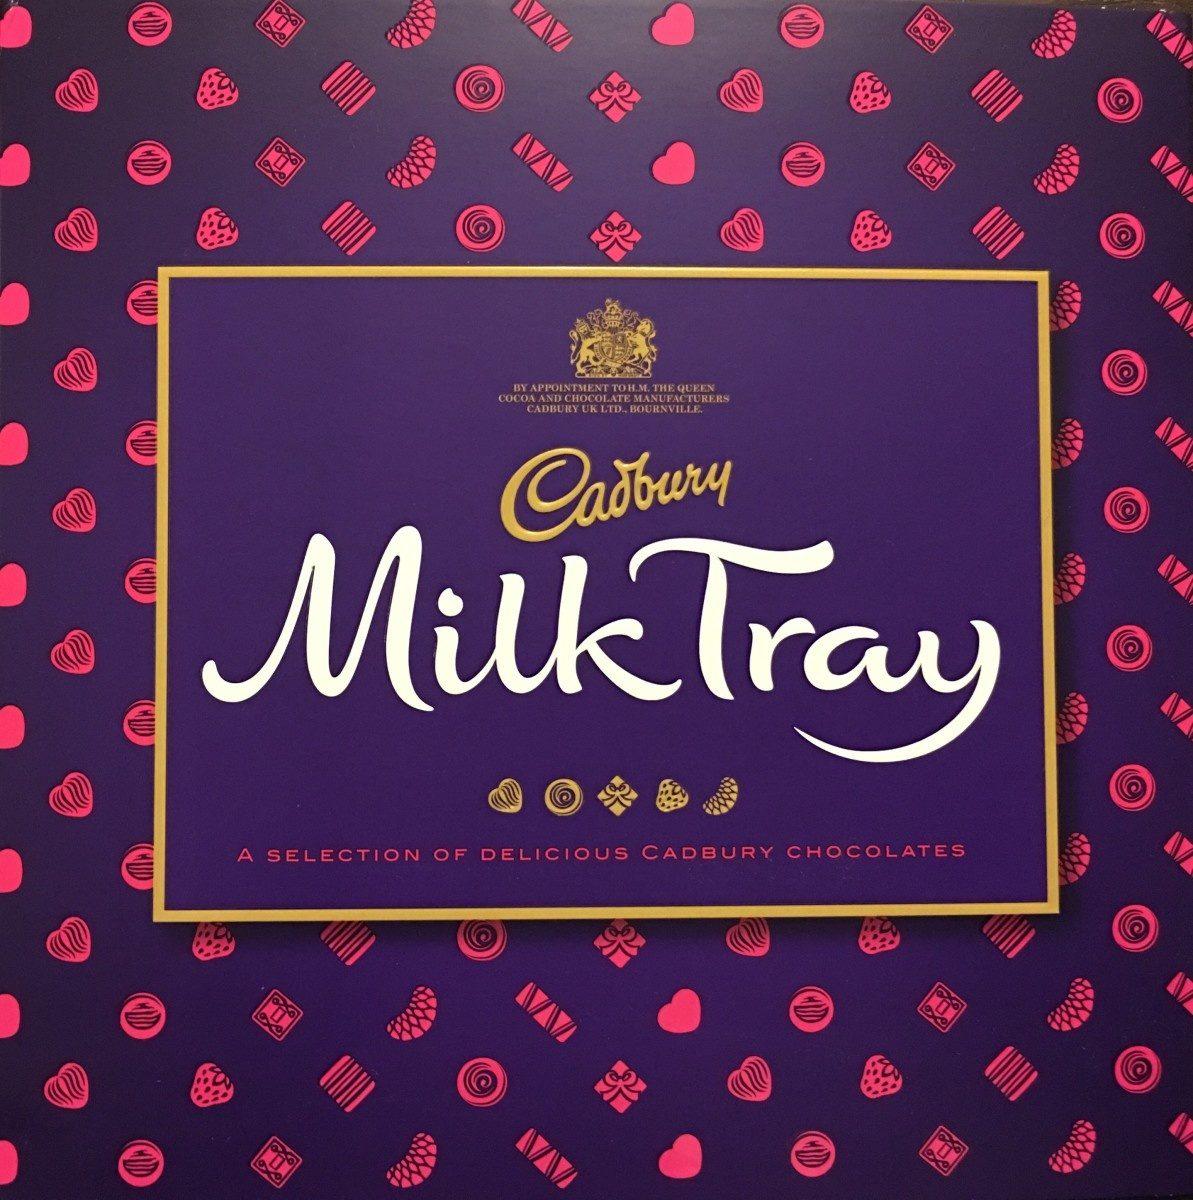 Milk Tray - Producte